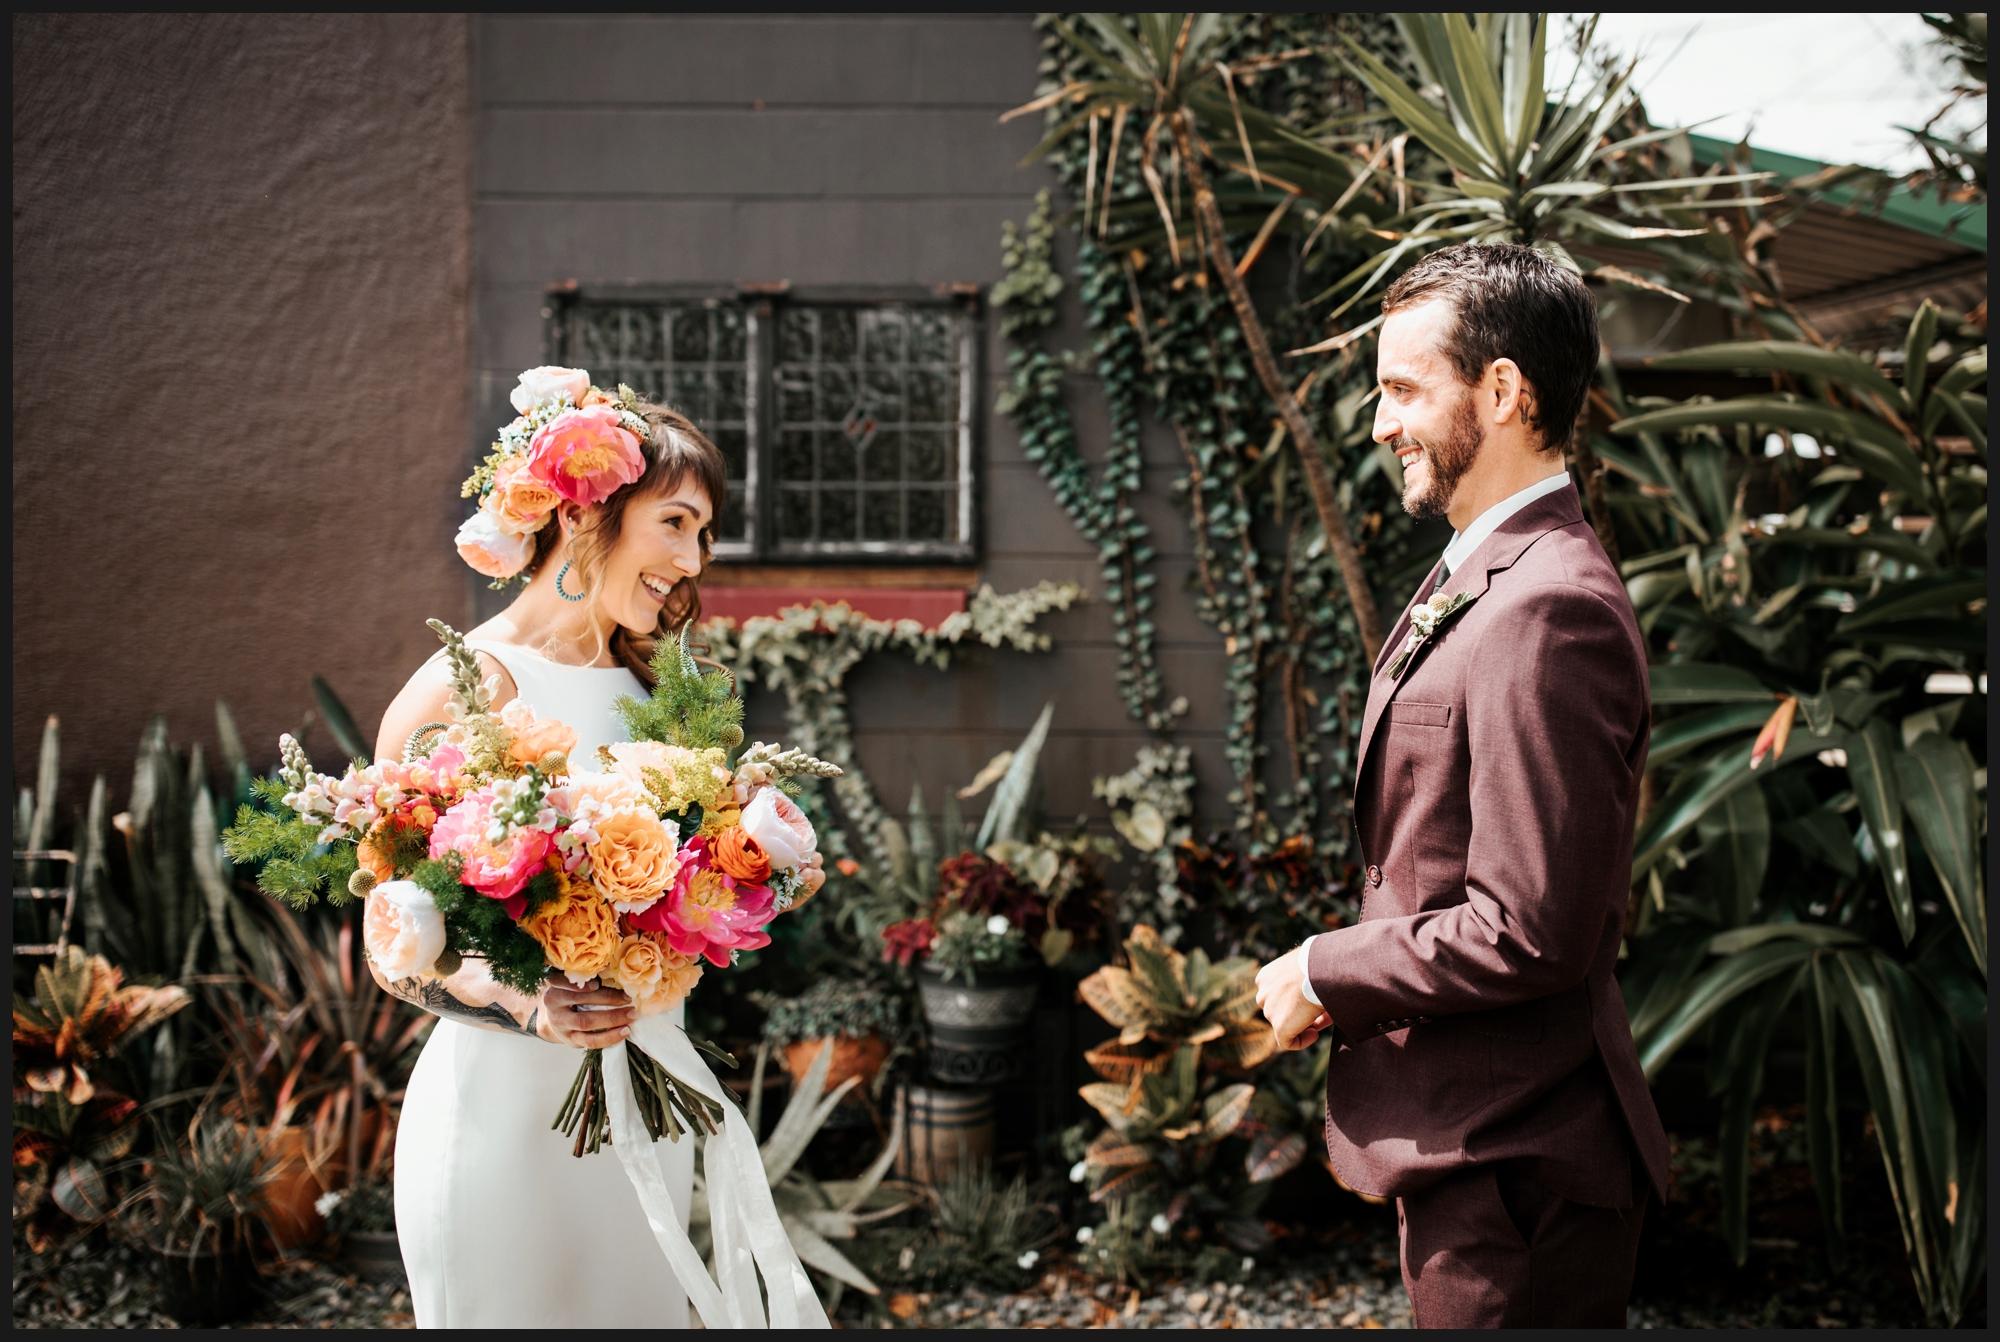 Orlando-Wedding-Photographer-destination-wedding-photographer-florida-wedding-photographer-bohemian-wedding-photographer_1973.jpg